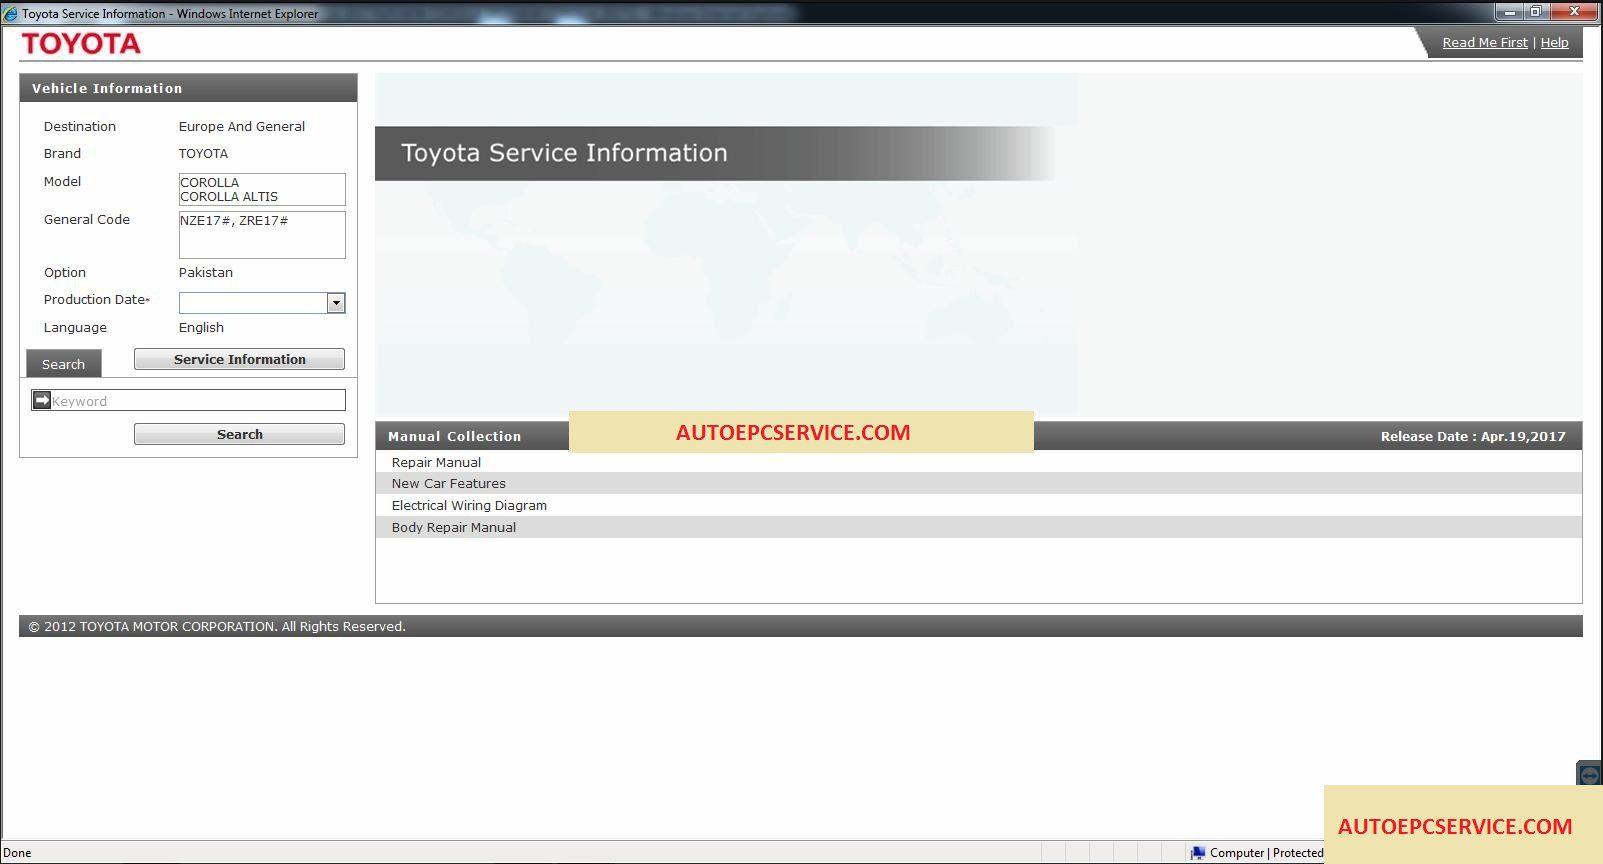 Toyota COROLLA ALTIS [07.2017] GSIC Workshop Manual – Auto Repair  Software-Auto EPC Software-Auto Repair Manual-Workshop Manual-Service Manual -Workshop ...